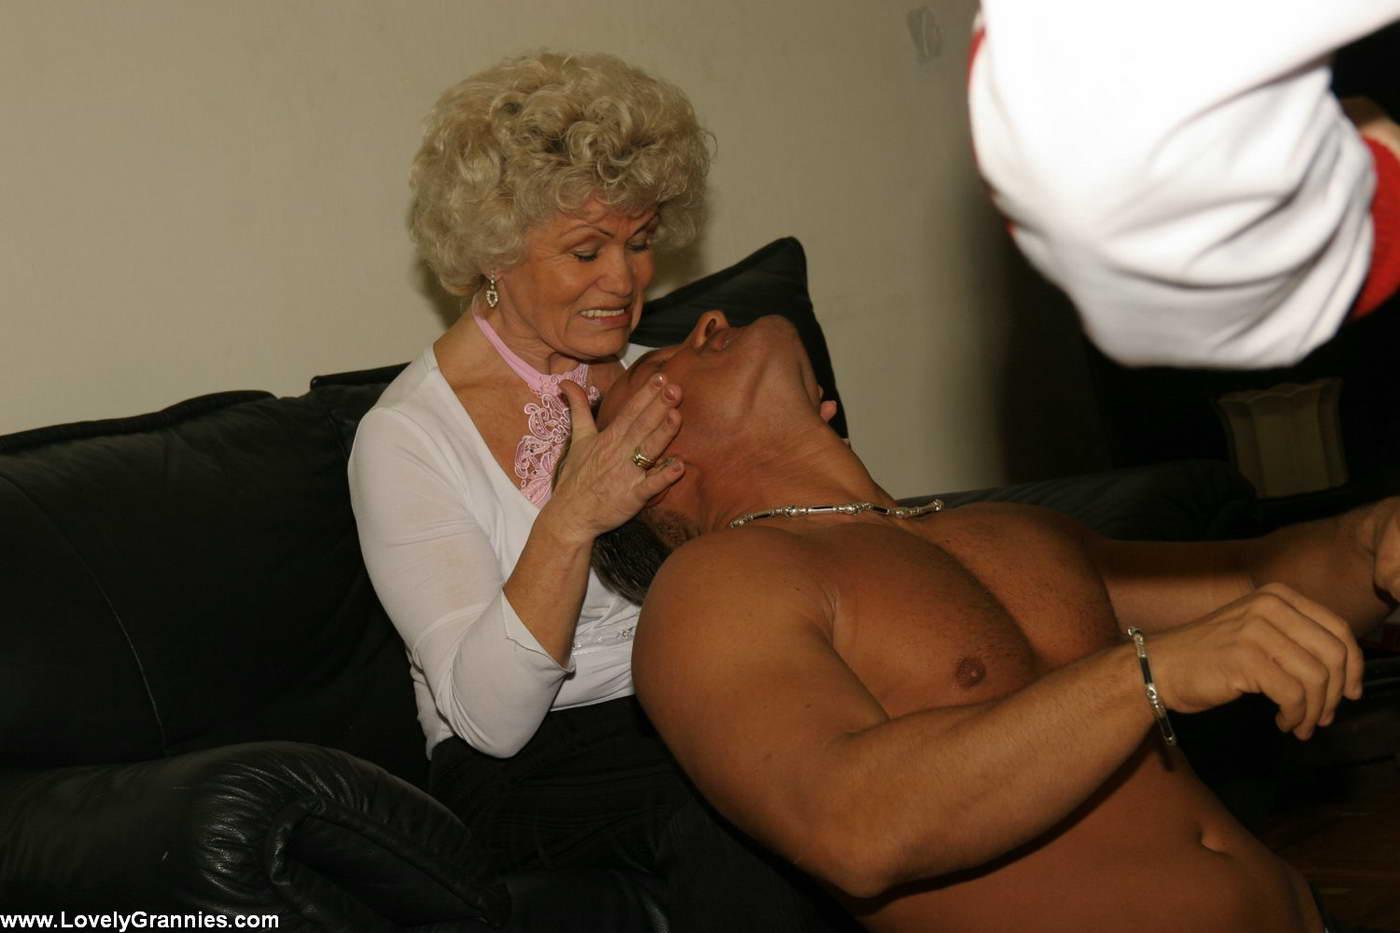 Granny porn samples erotic picture